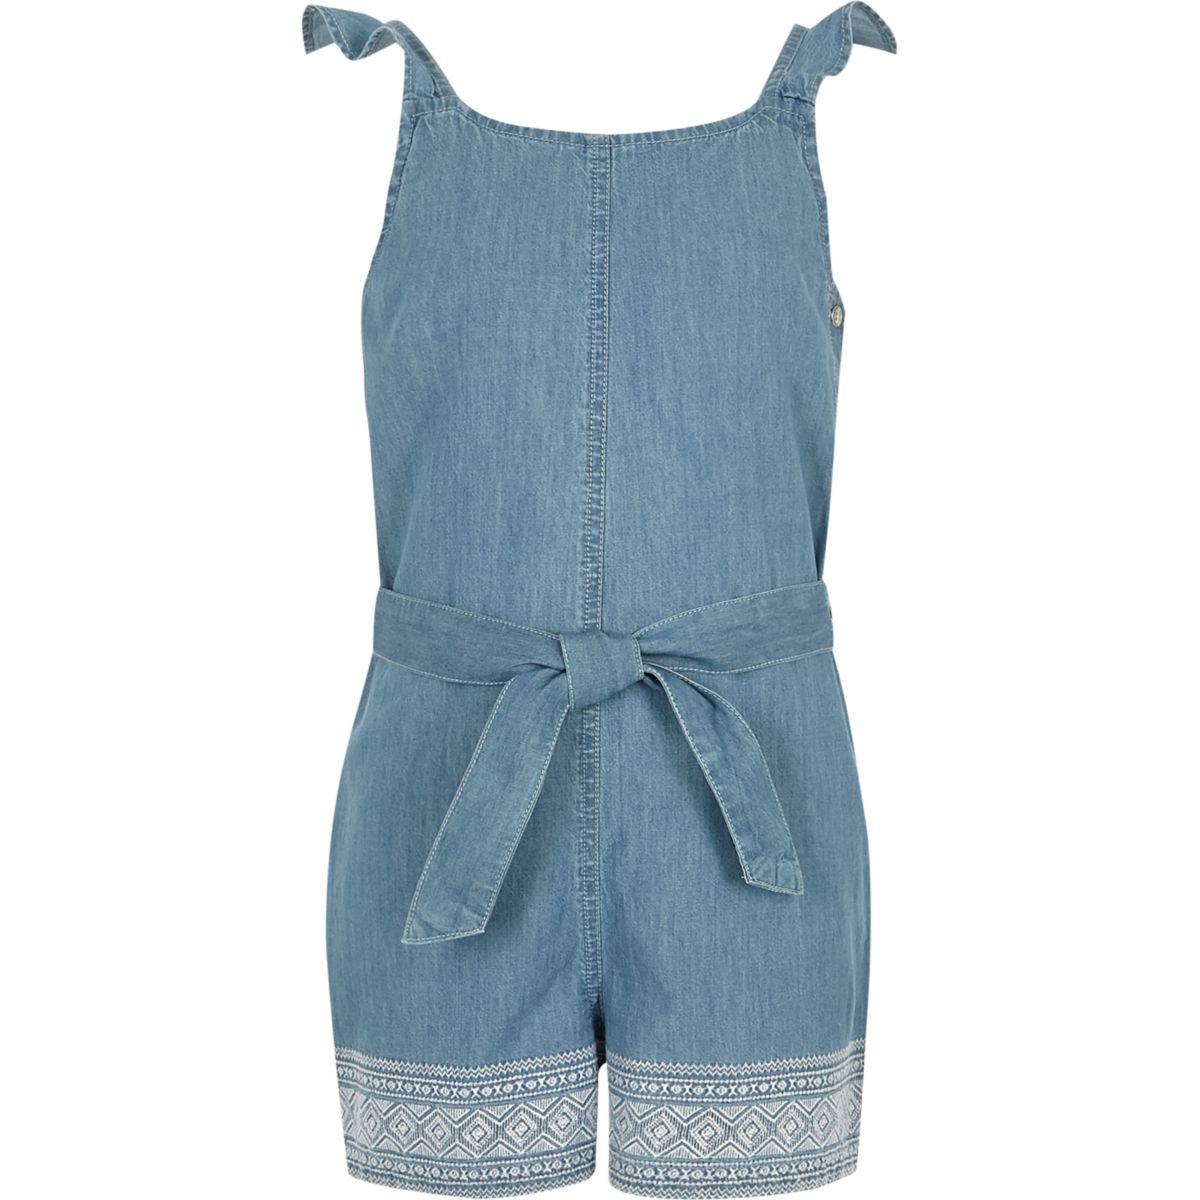 Girls blue denim embroidered playsuit